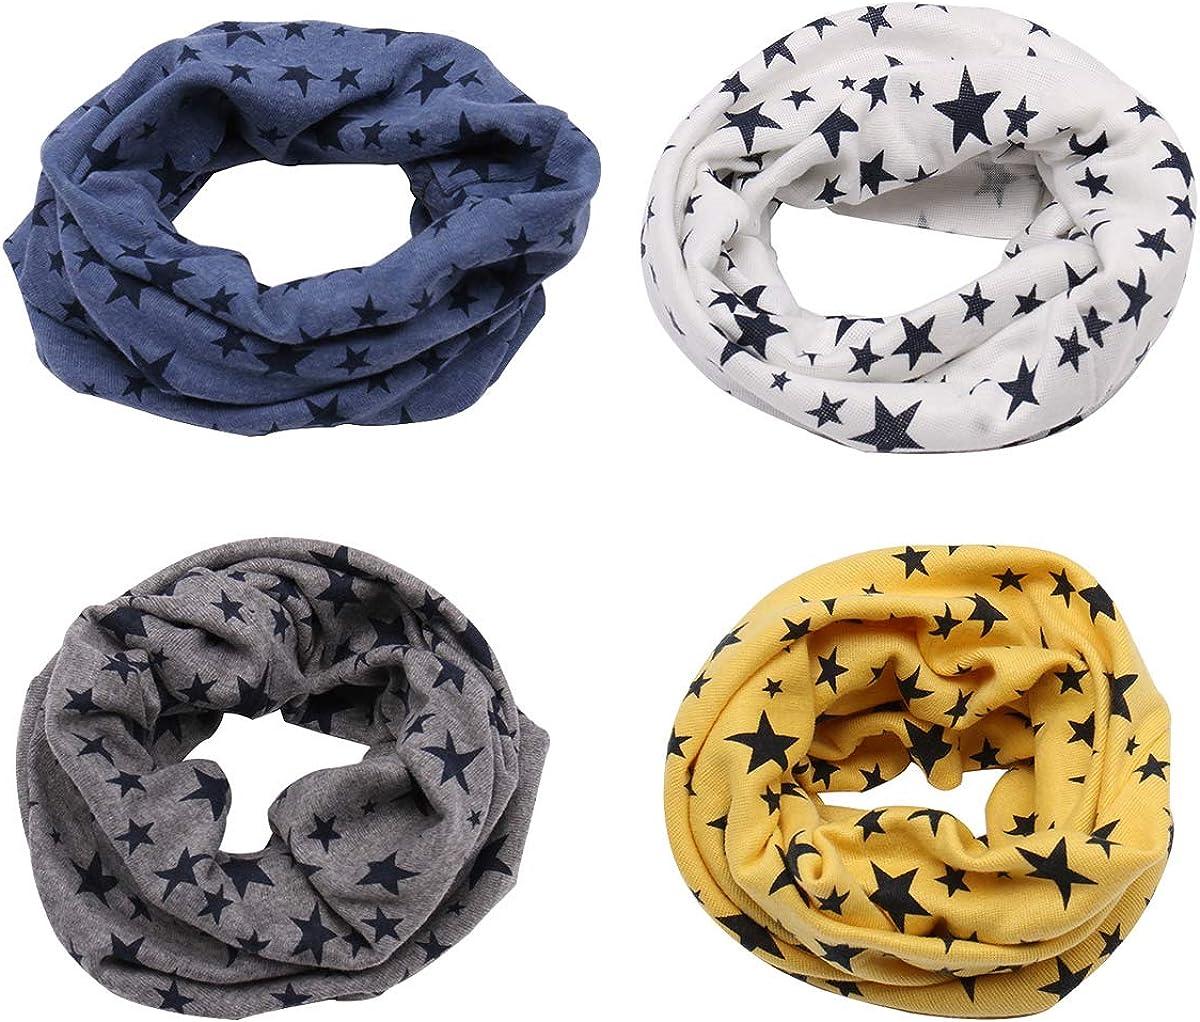 Richaa Star Winter Cotton Neck Warmer for Boys Girls Multi Use O-Ring Collar Scarfs Hat Bandana 4 PCS Infinity Scarves for Kids